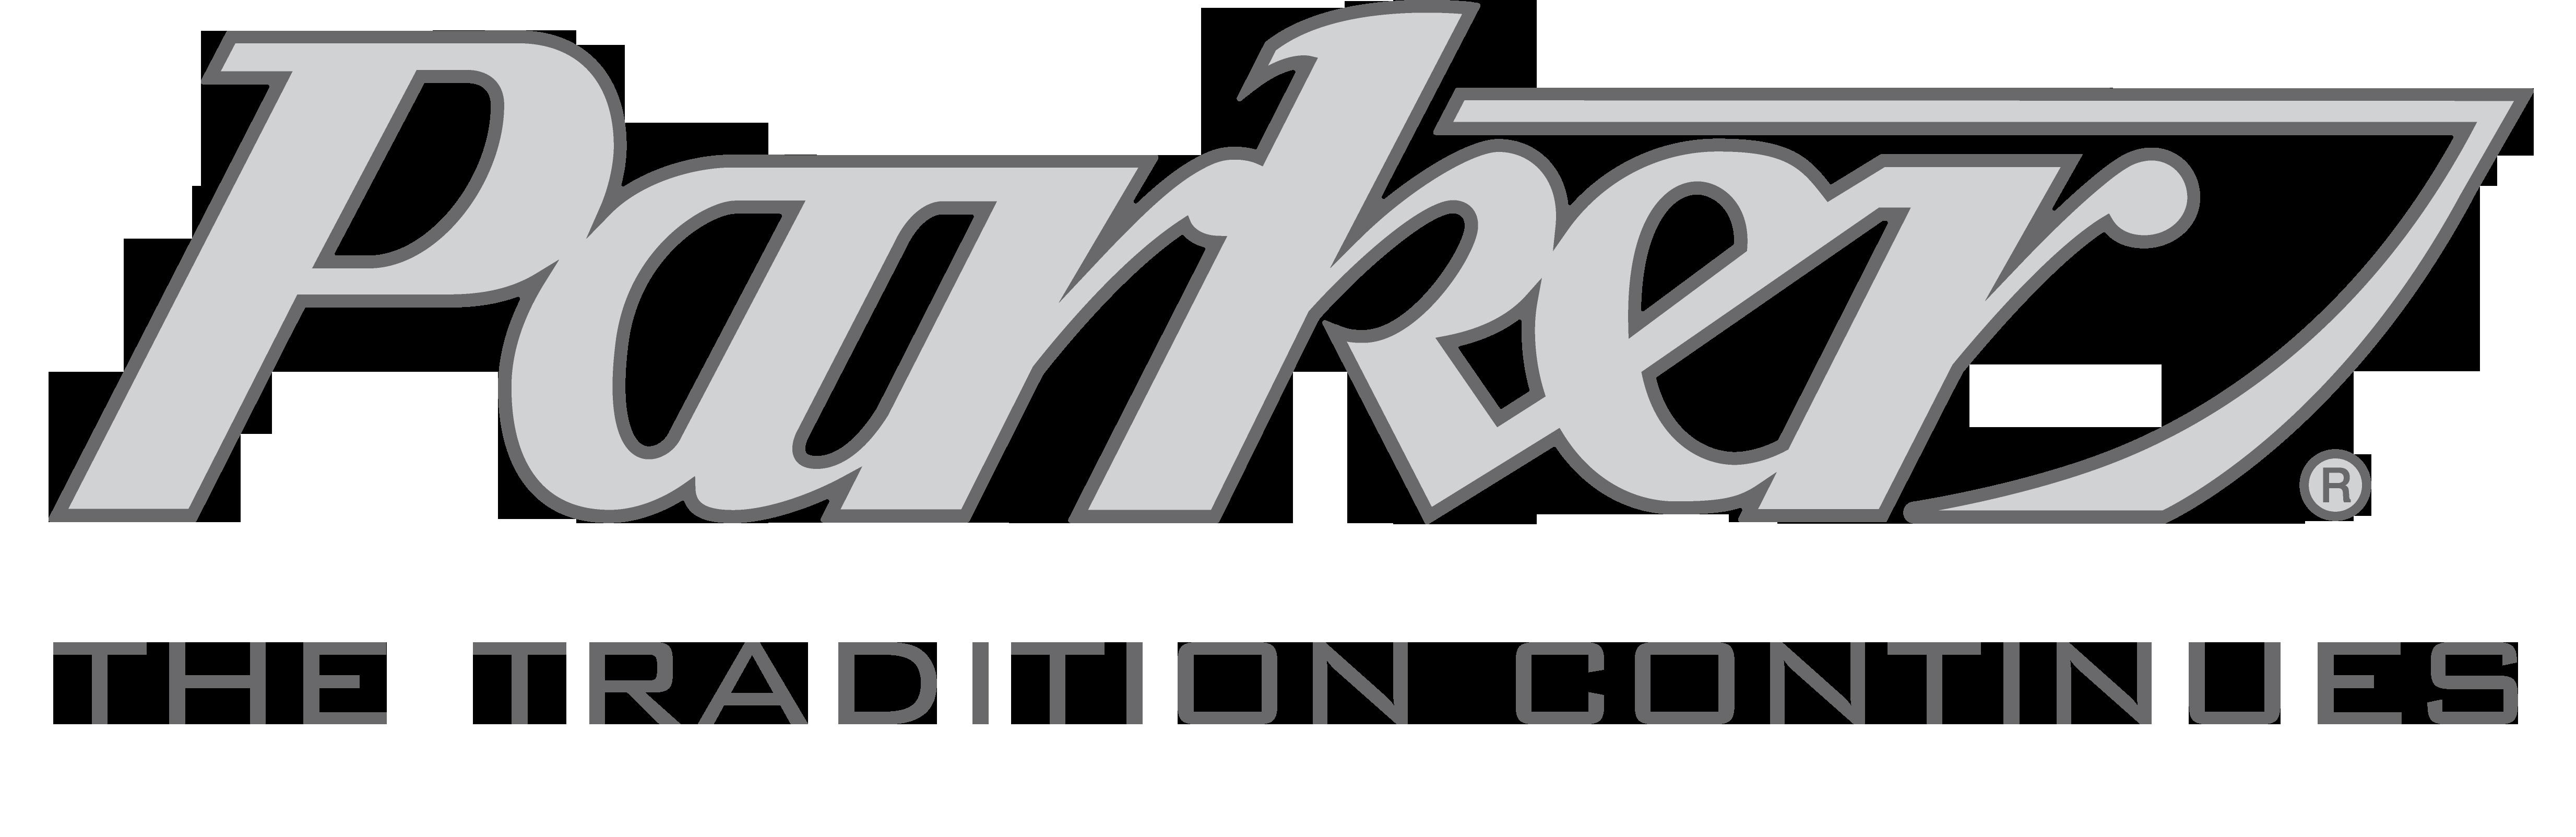 Parker_Tradition_Logo